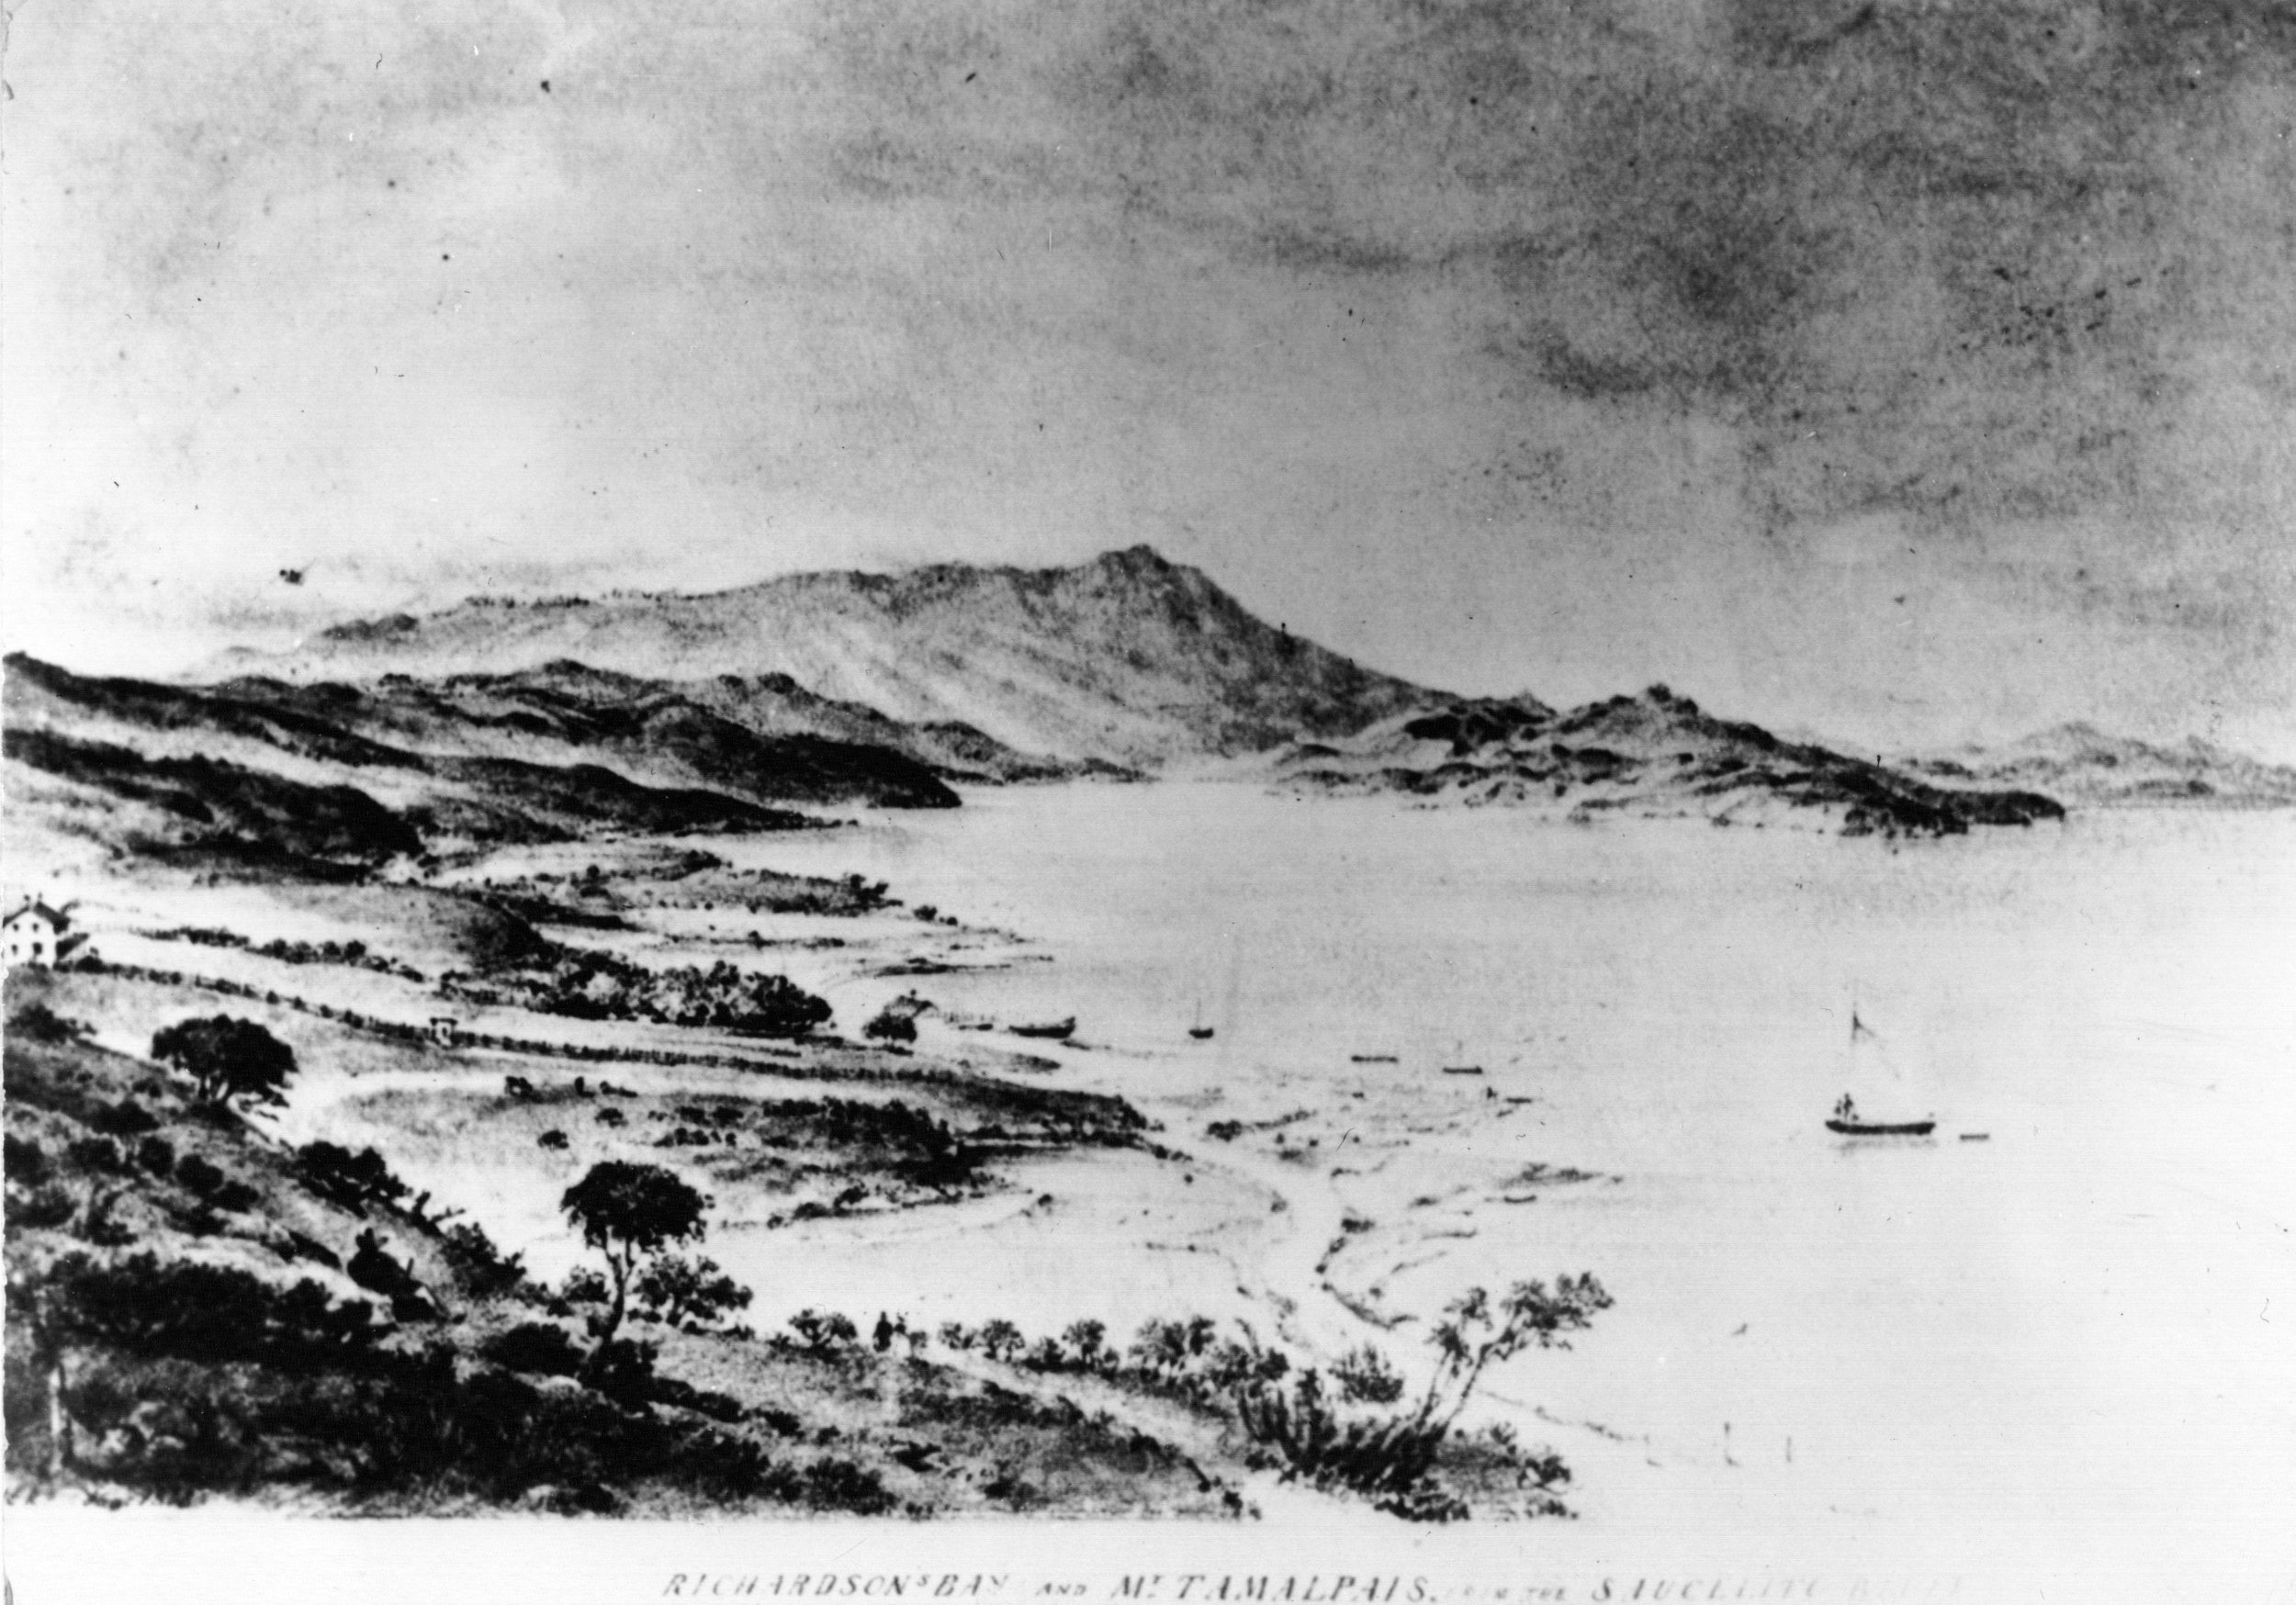 Richardson's homesite c. 1841. Photo courtesy of Sausalito Historical Society and Sausalito Woman's Club